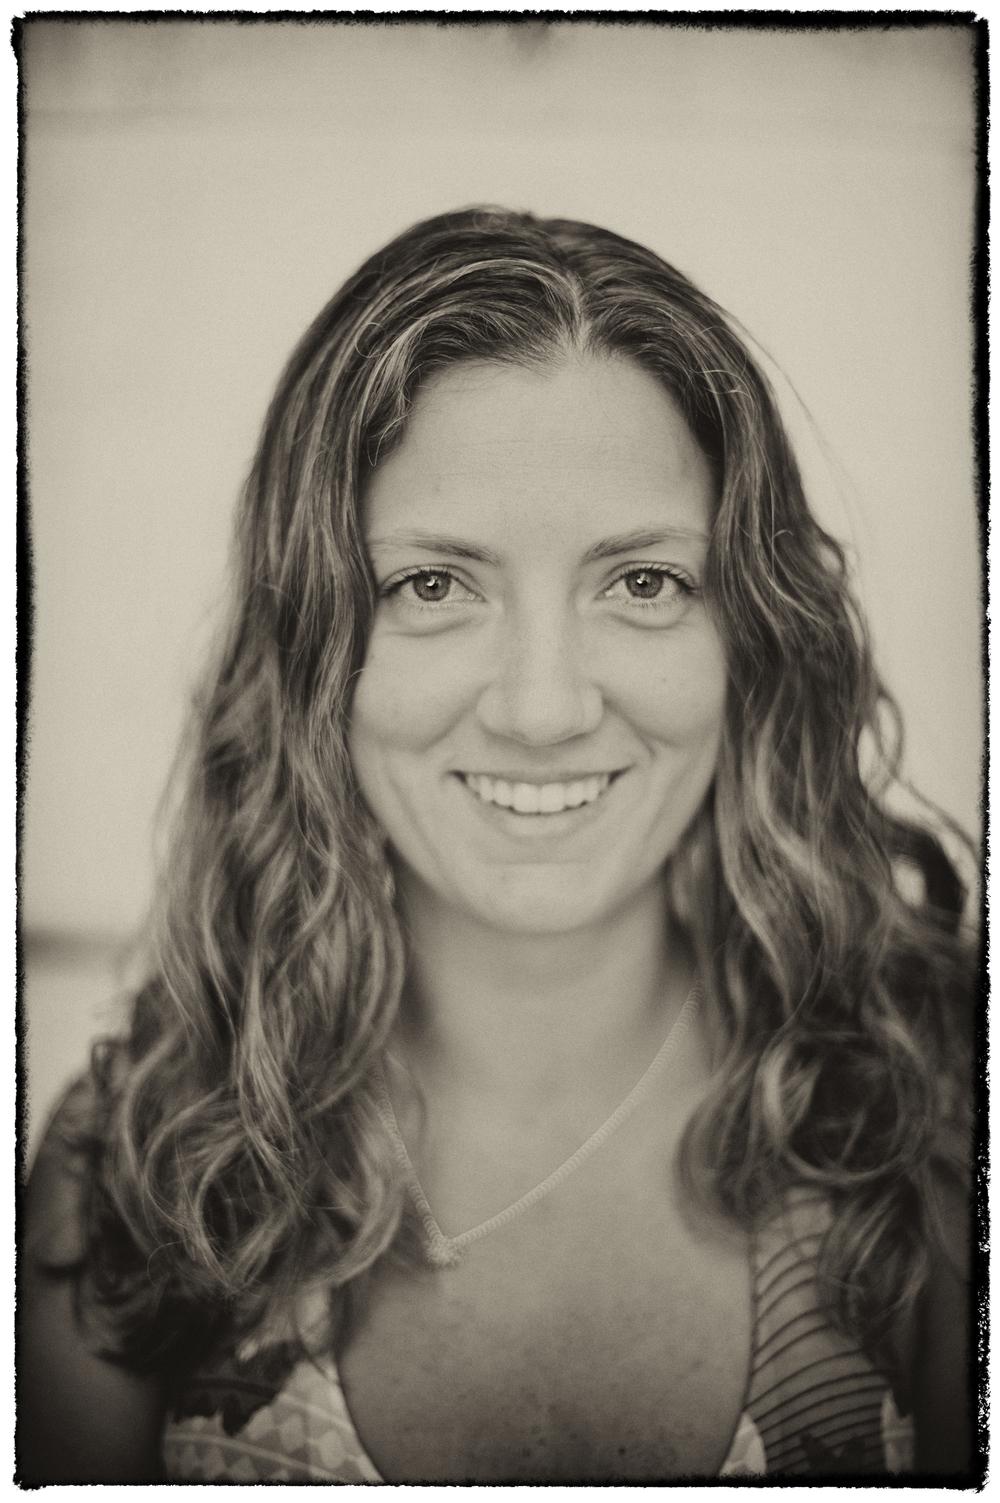 e-FOTOMDC PORTRAIT Fernanda Zereu WEB 6206.JPG